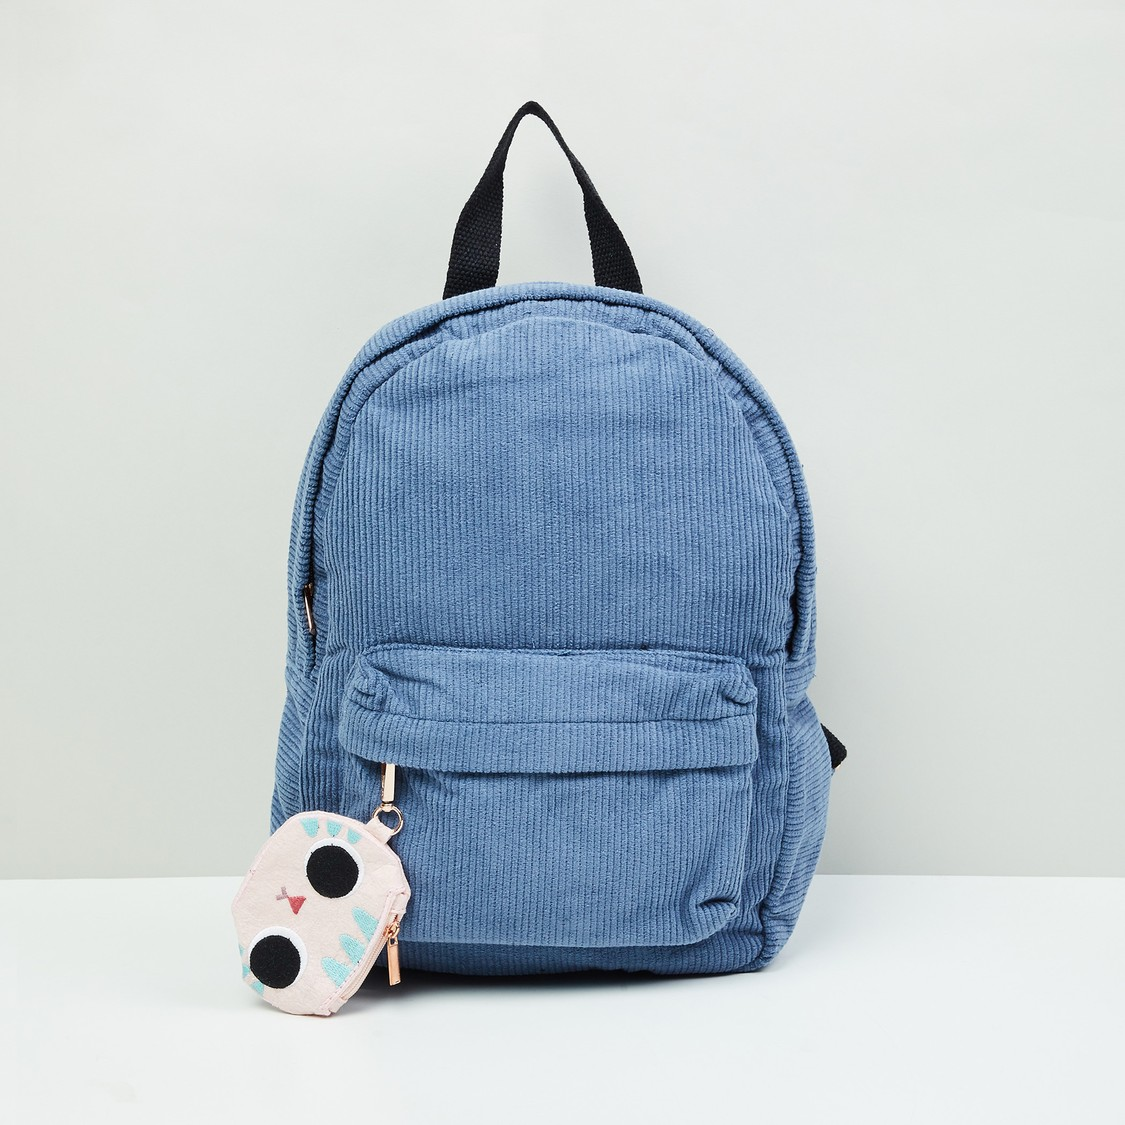 MAX Textured Zip-Closure Backpack